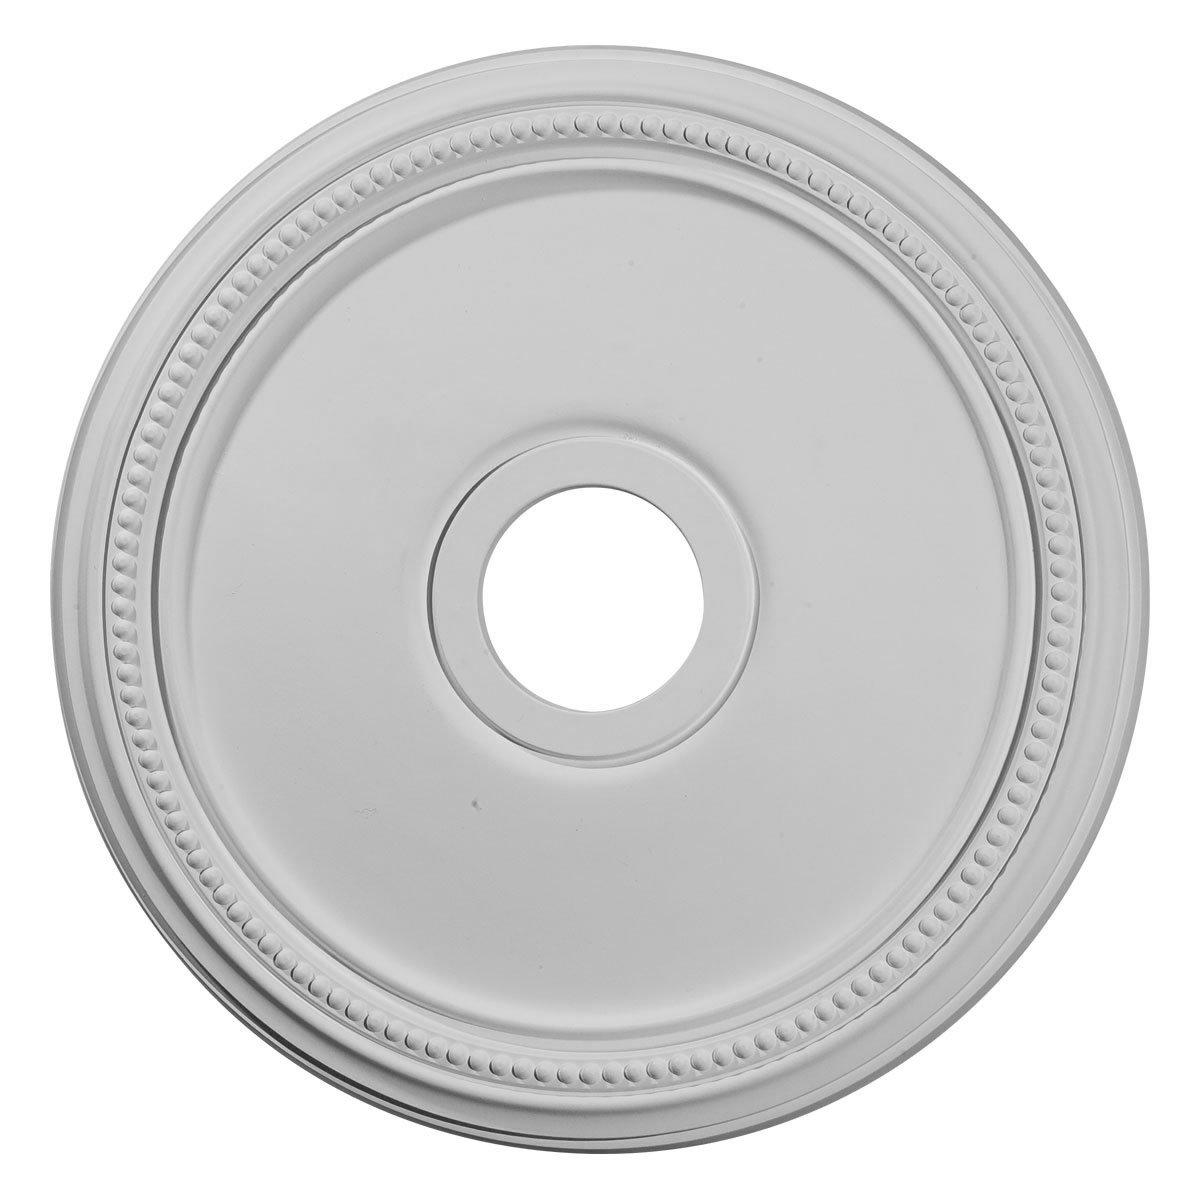 Home Lighting Ceiling Medallions Amazon – Chandelier Medallion